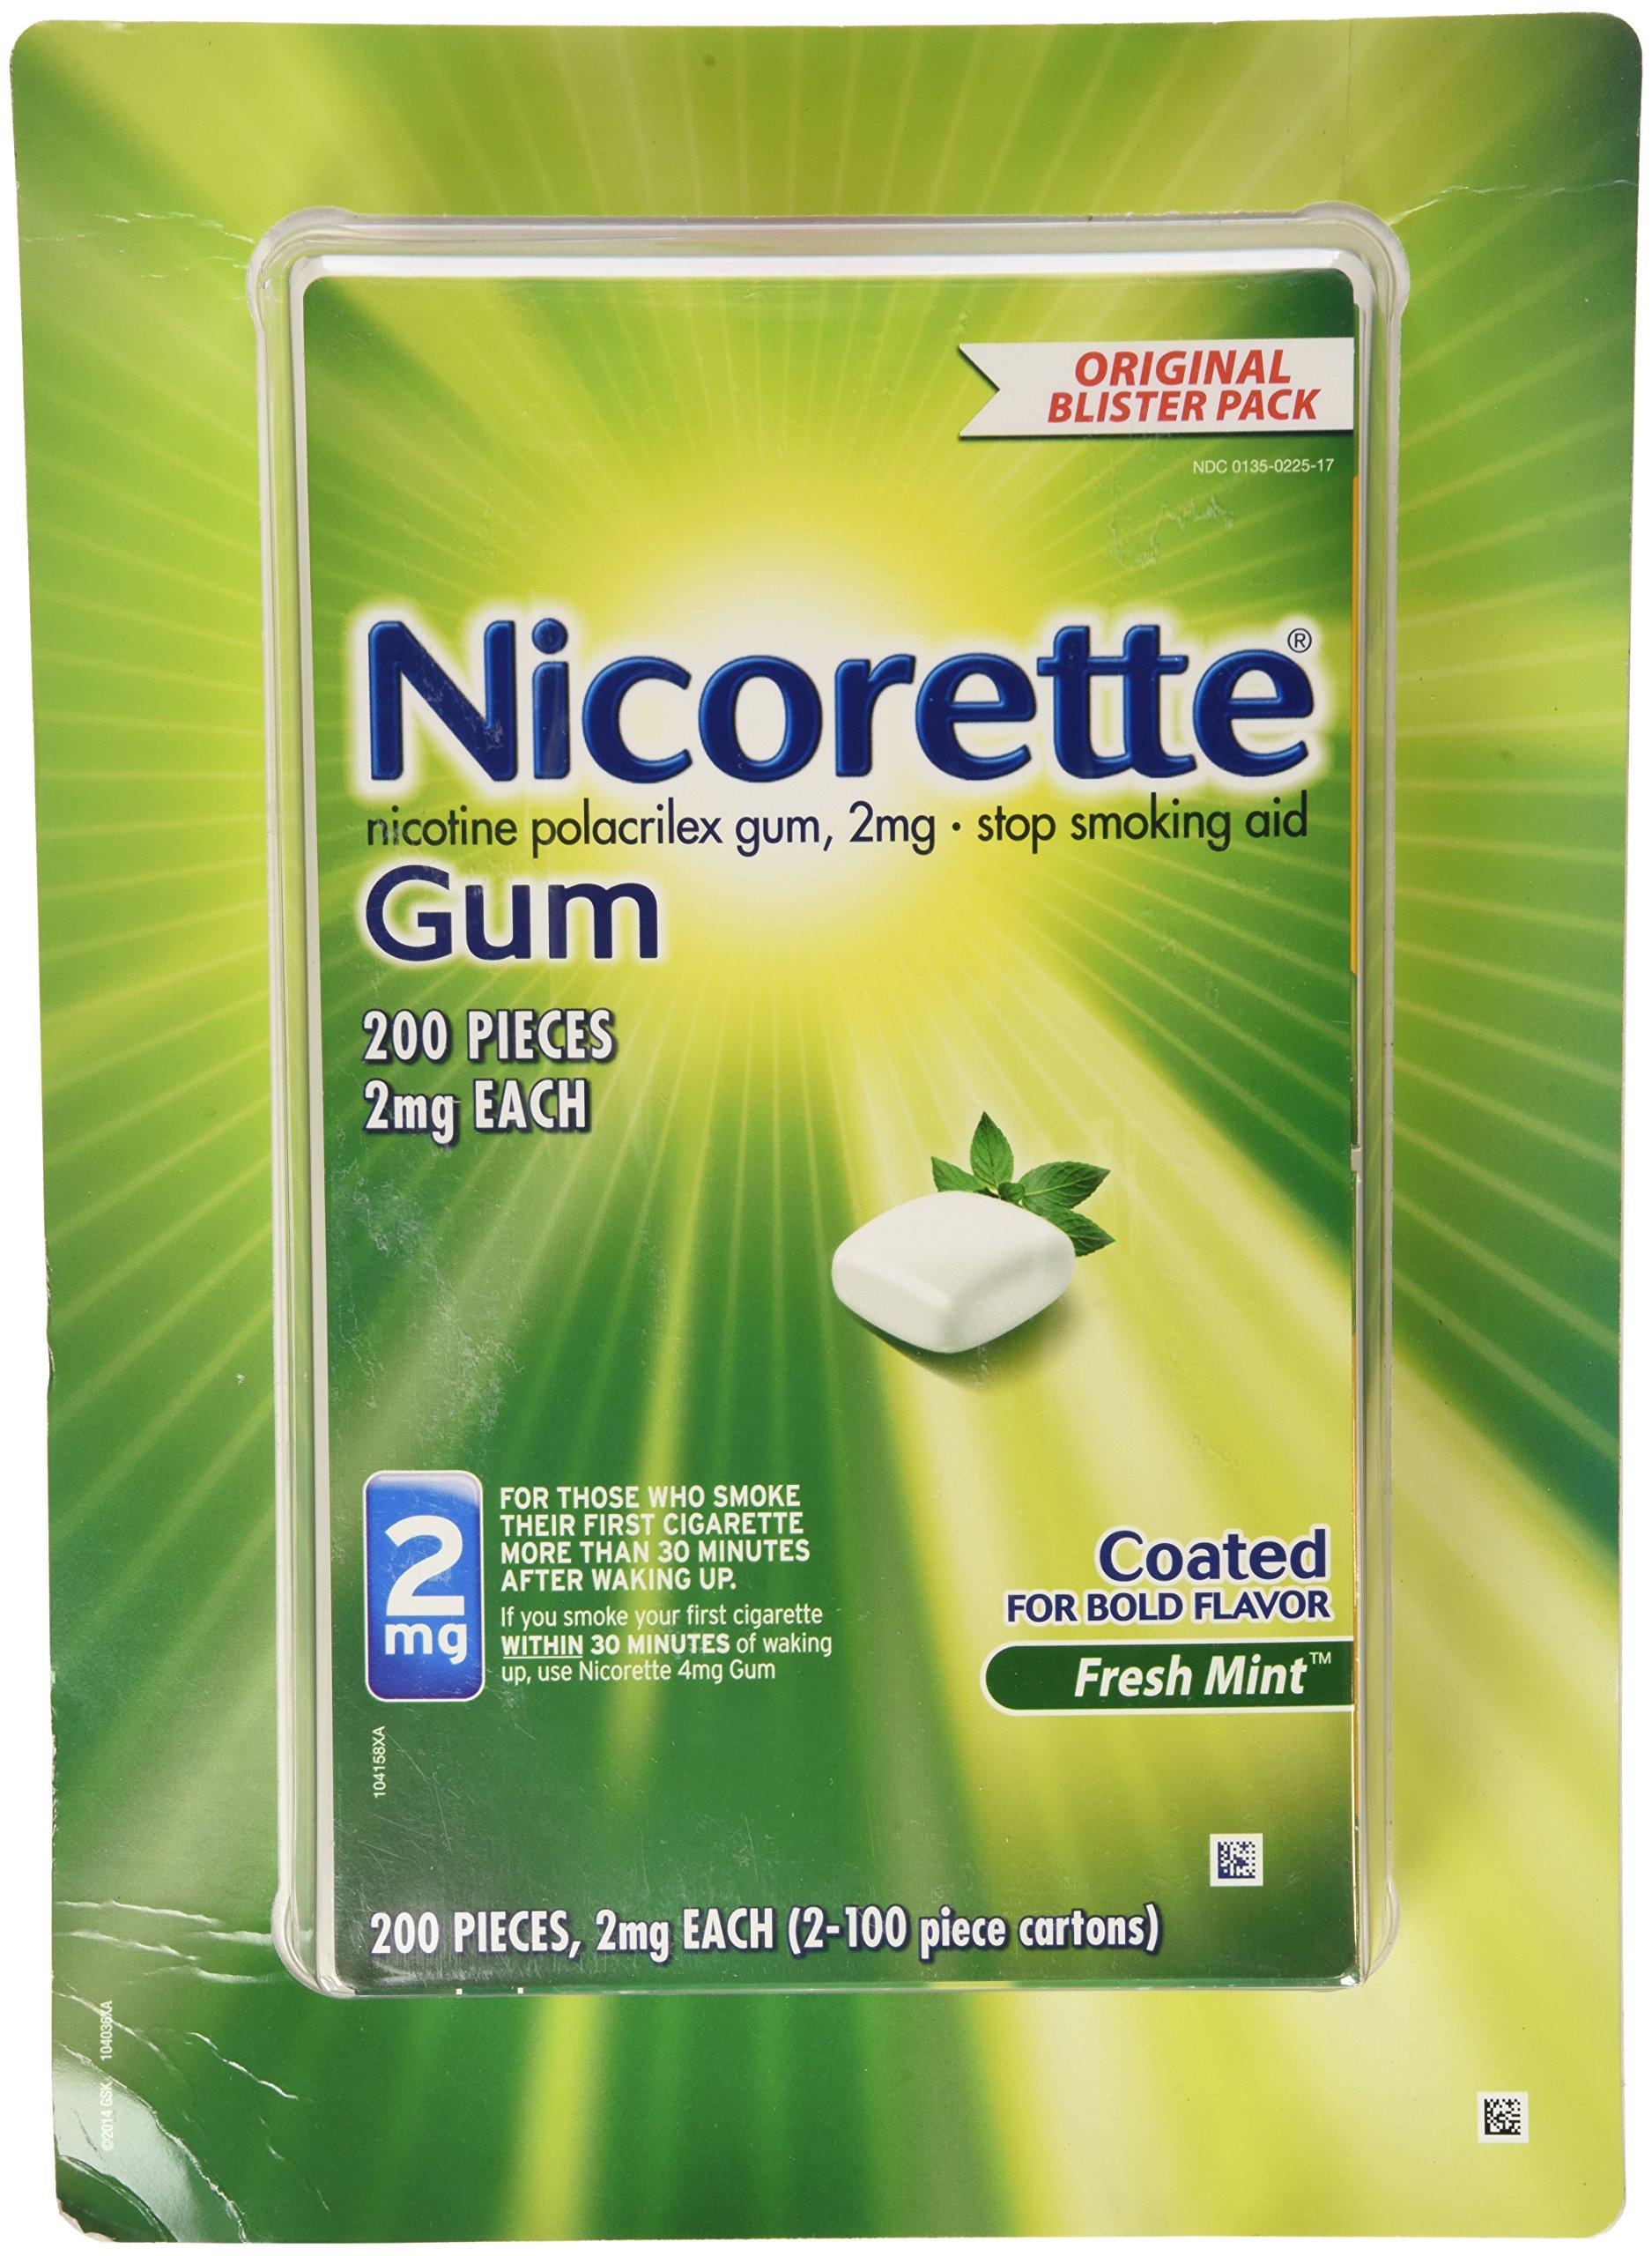 Nicorette Nicotine Gum Polacrilex Coated, Fresh Mint, 2 milligram, 200 Count